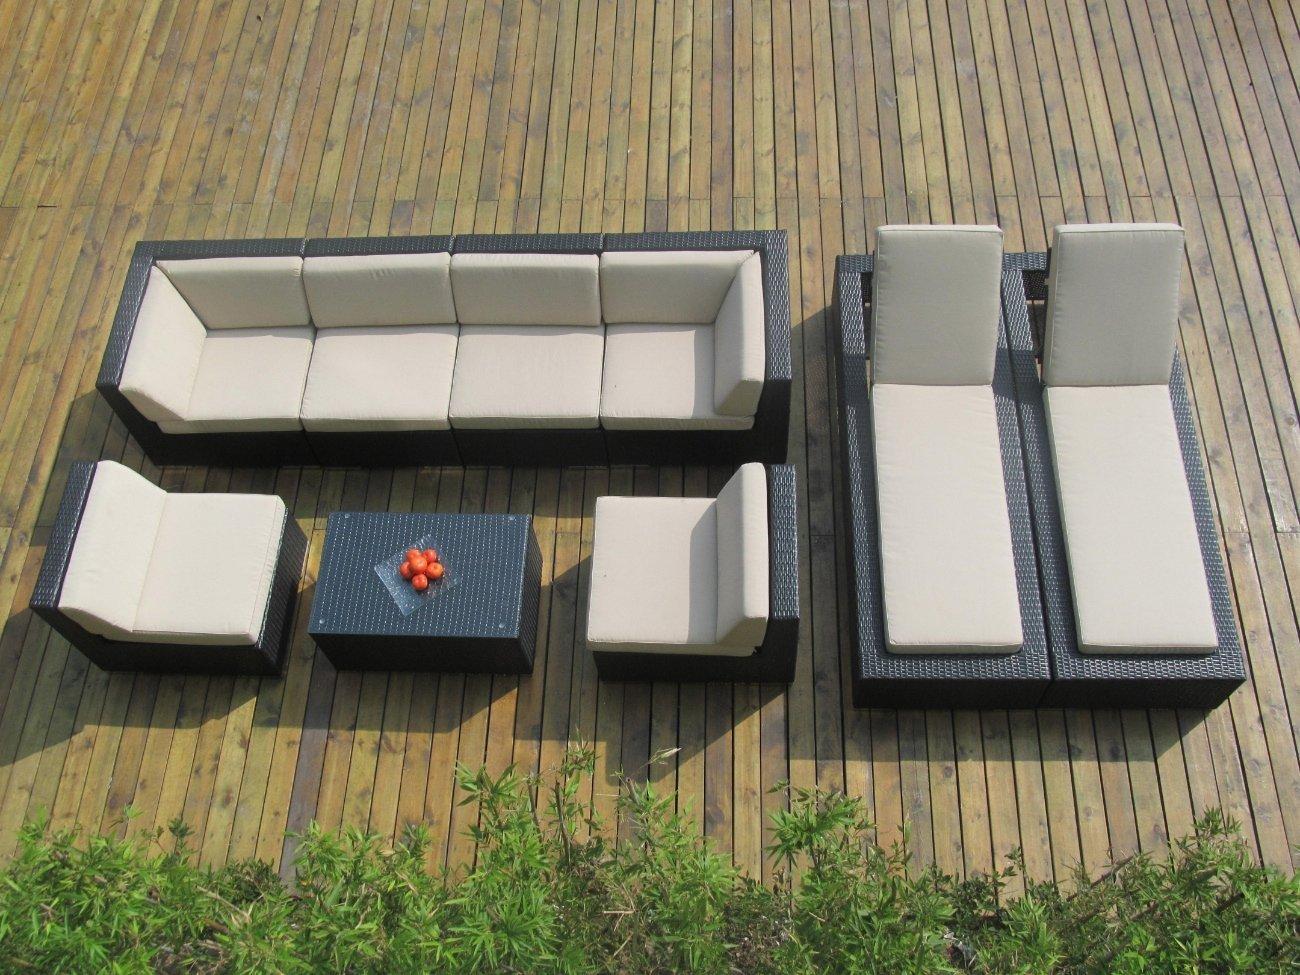 Genuine ohana outdoor sectional sofa and chaise lounge 9pc for Ohana outdoor sectional sofa